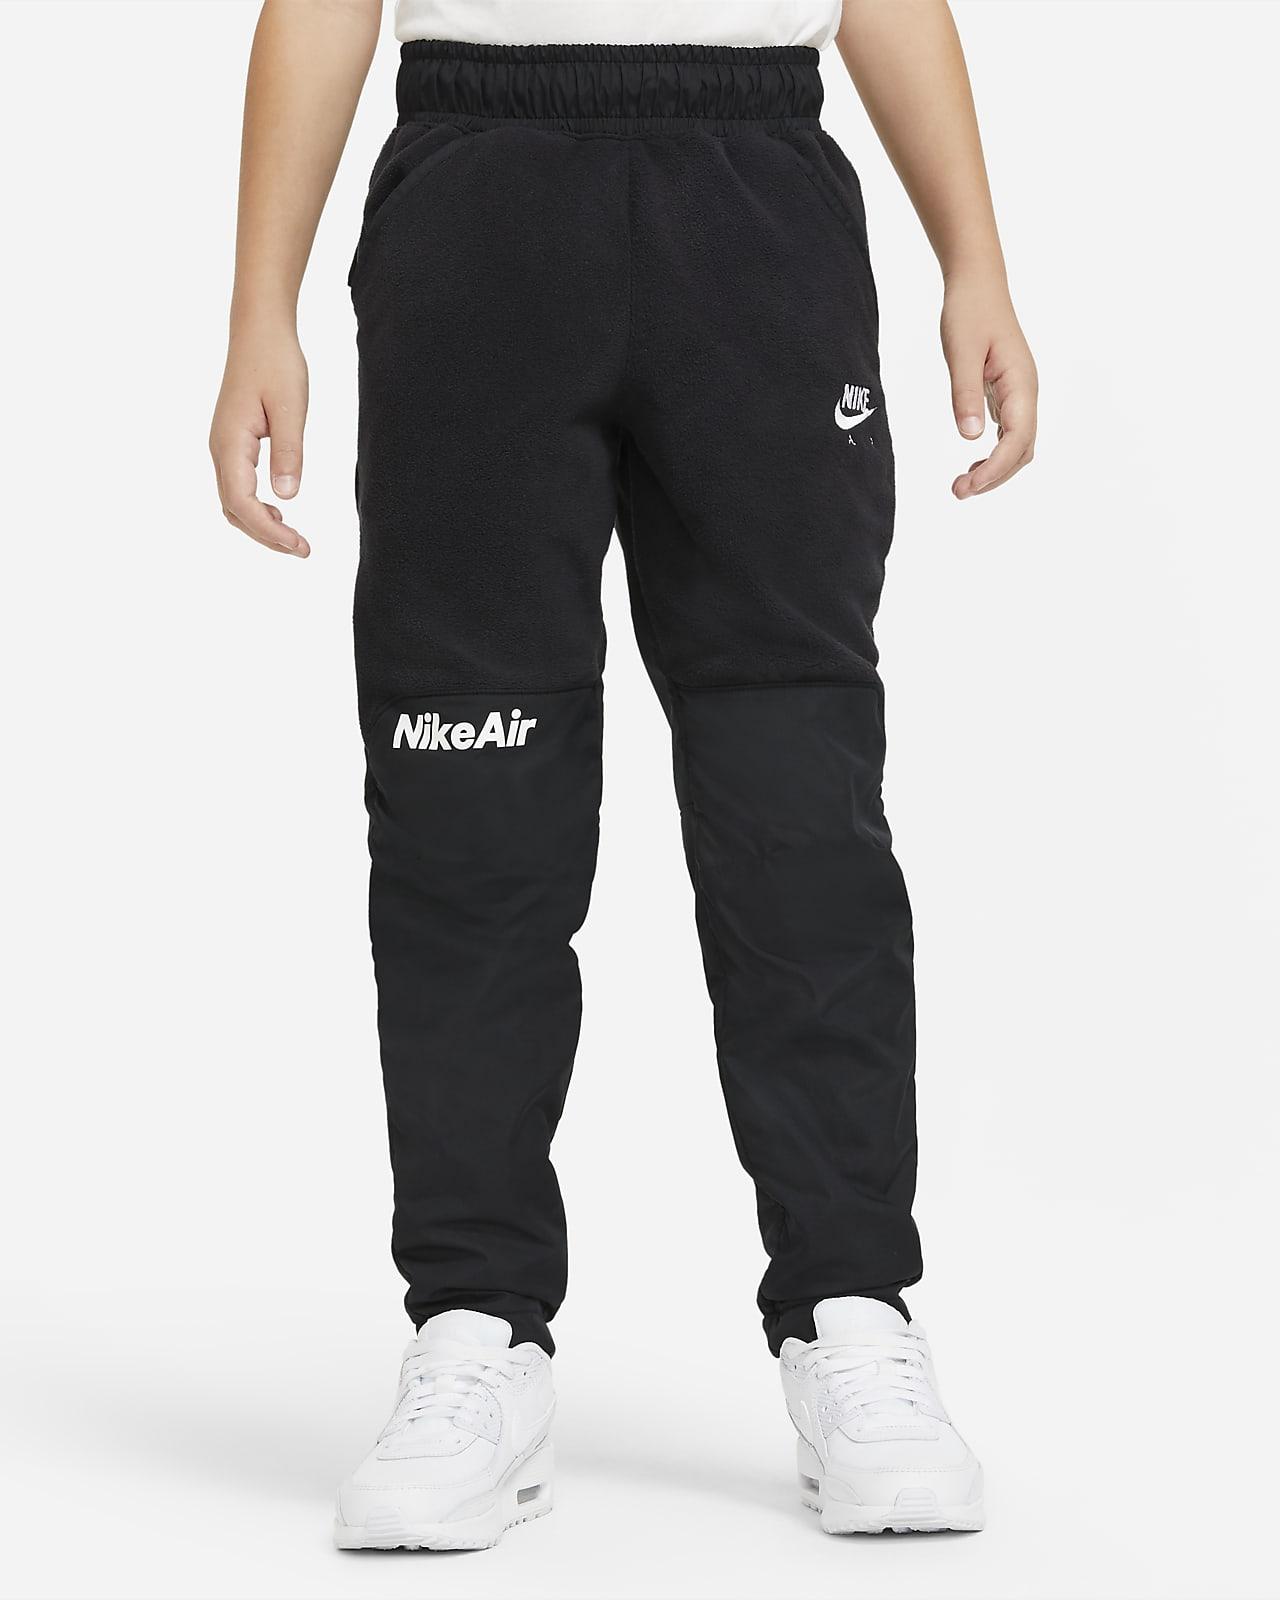 Nike Air Big Kids' (Boys') Winterized Pants